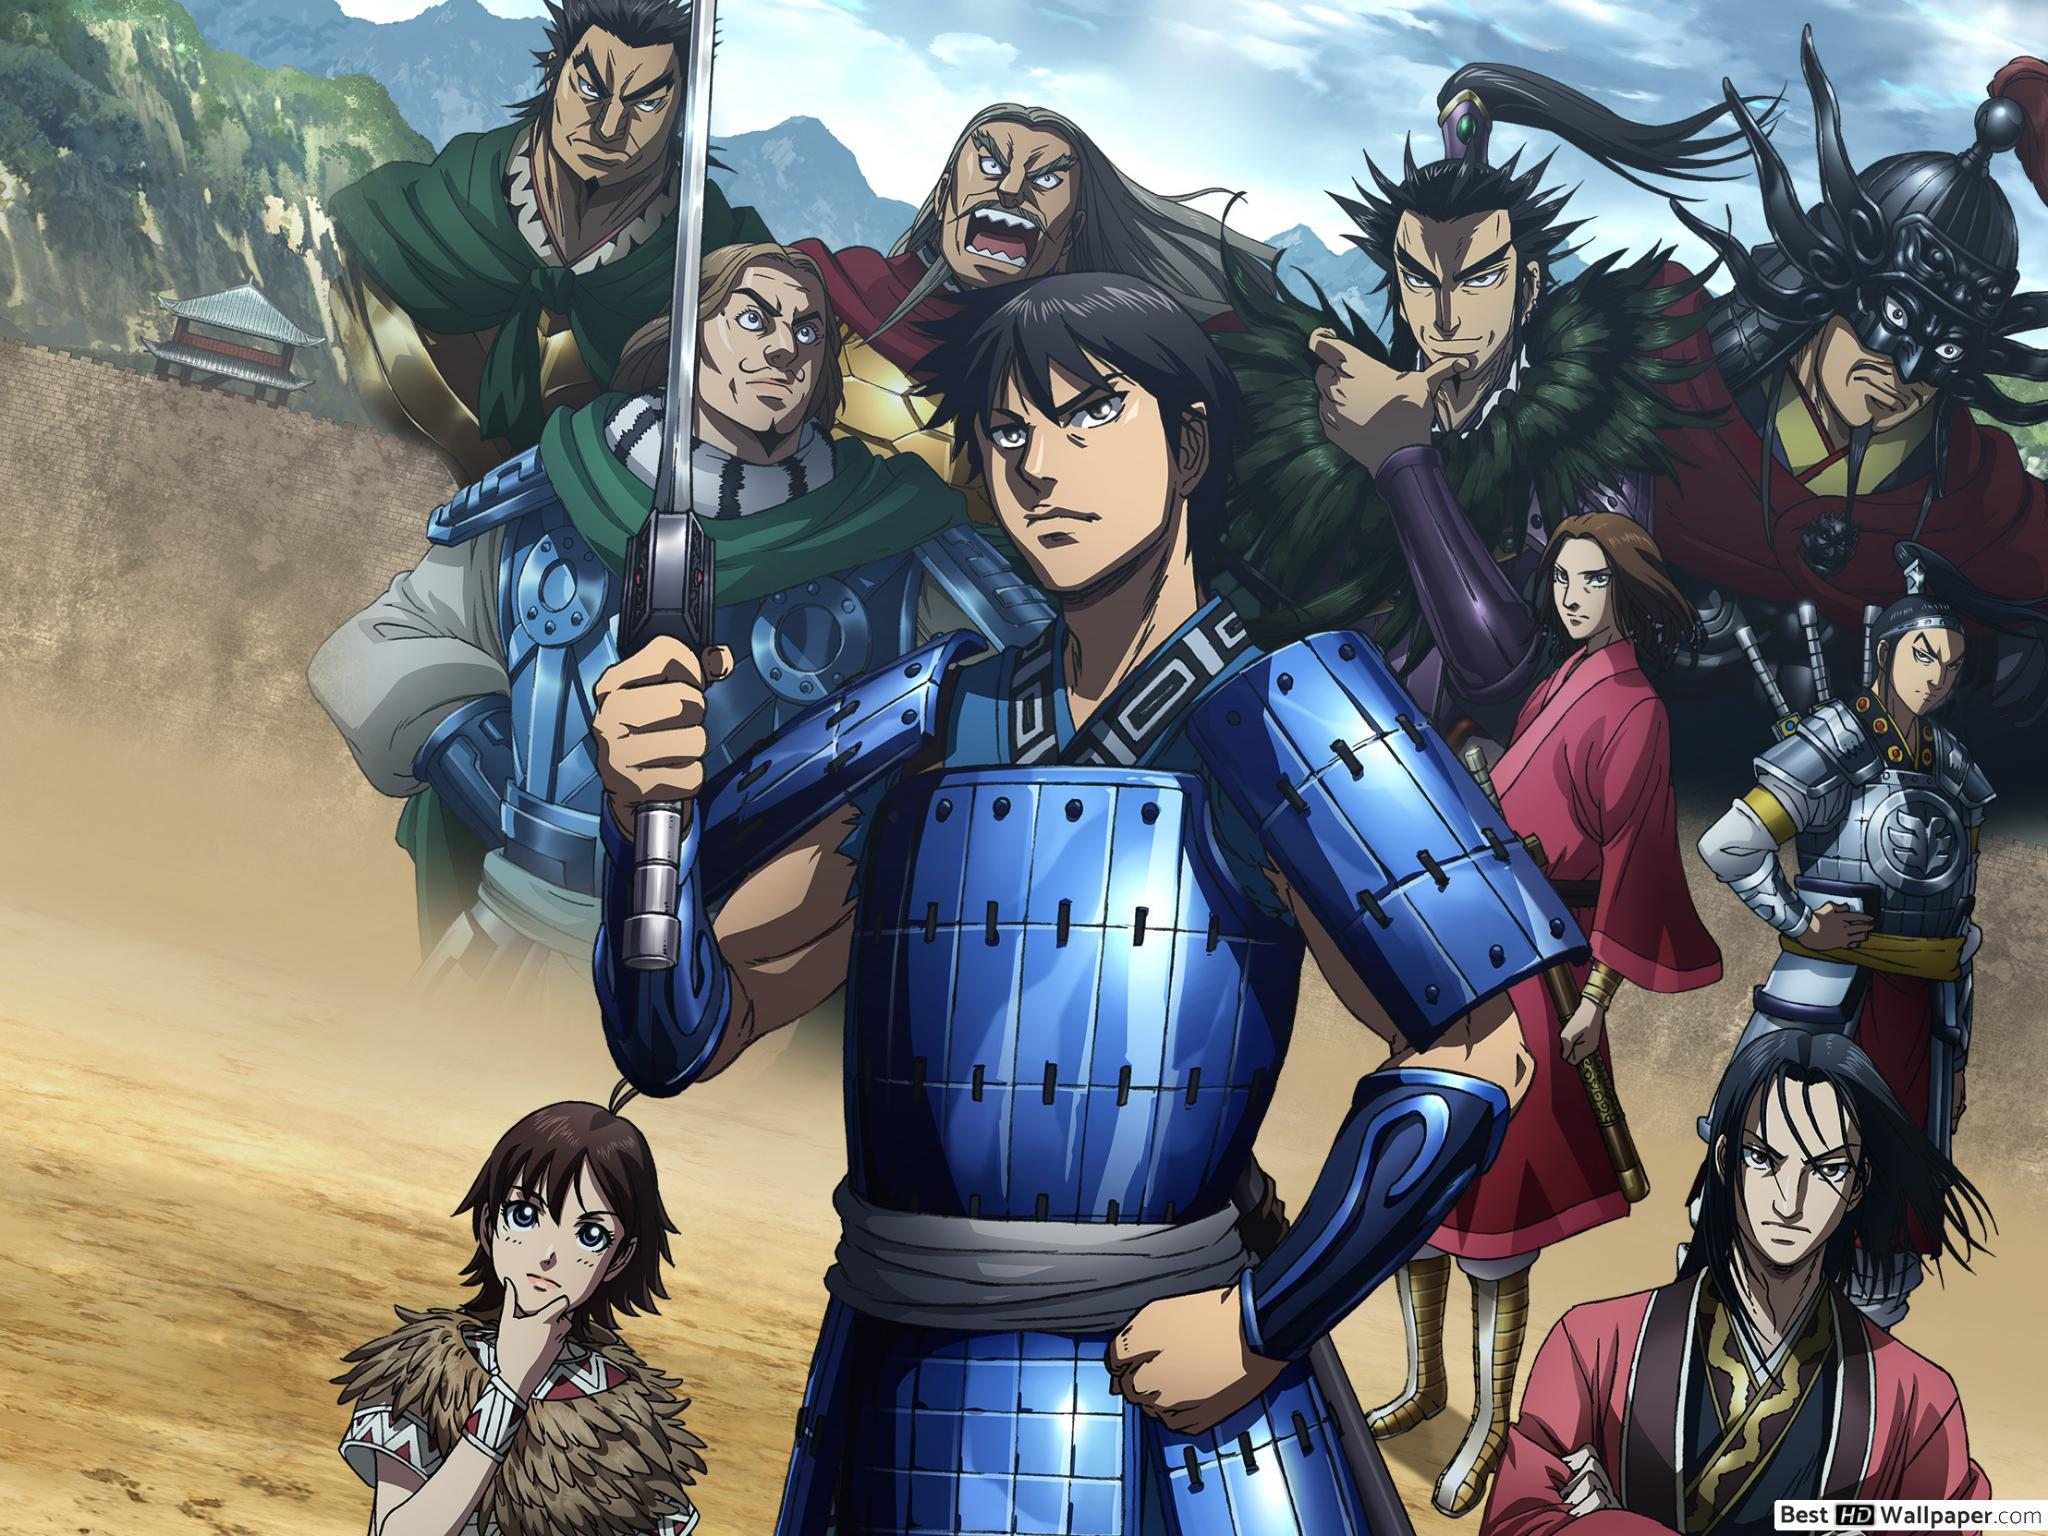 Kingdom 3 Episode 15 Release Date, Spoiler, And Watch Online